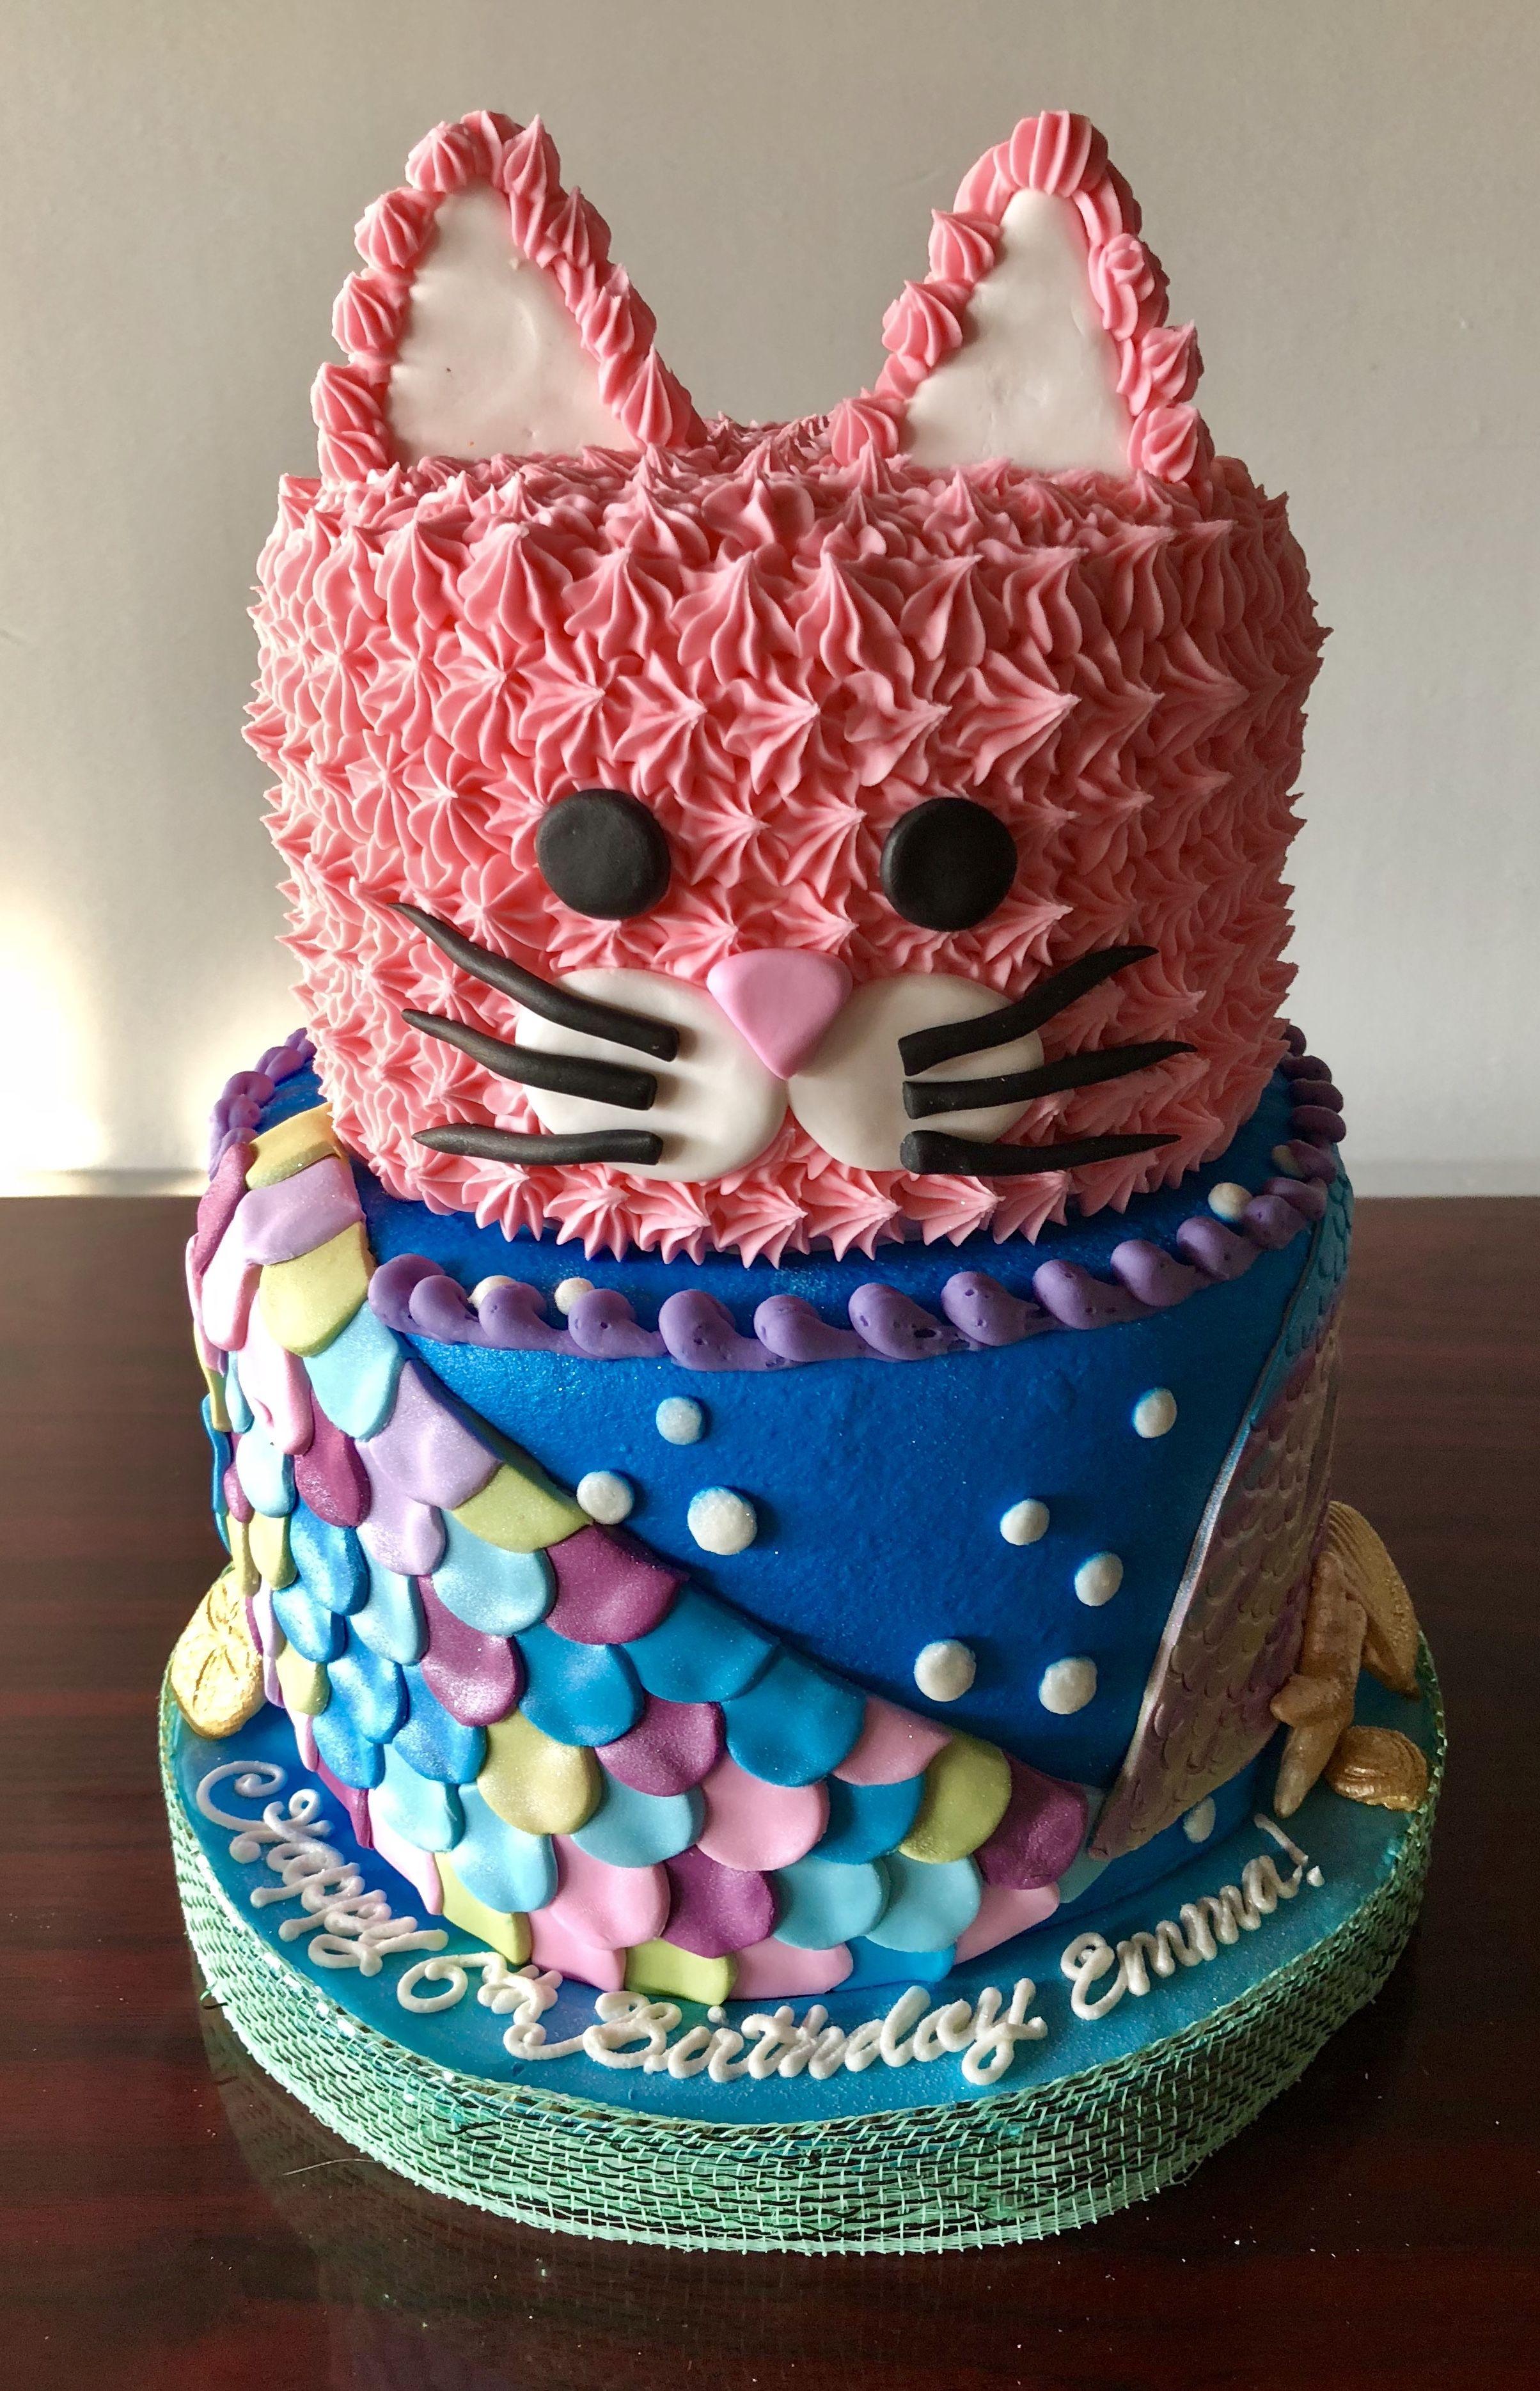 Kitty And Mermaid Cake Adrienne Co Bakery Little Girl Birthday